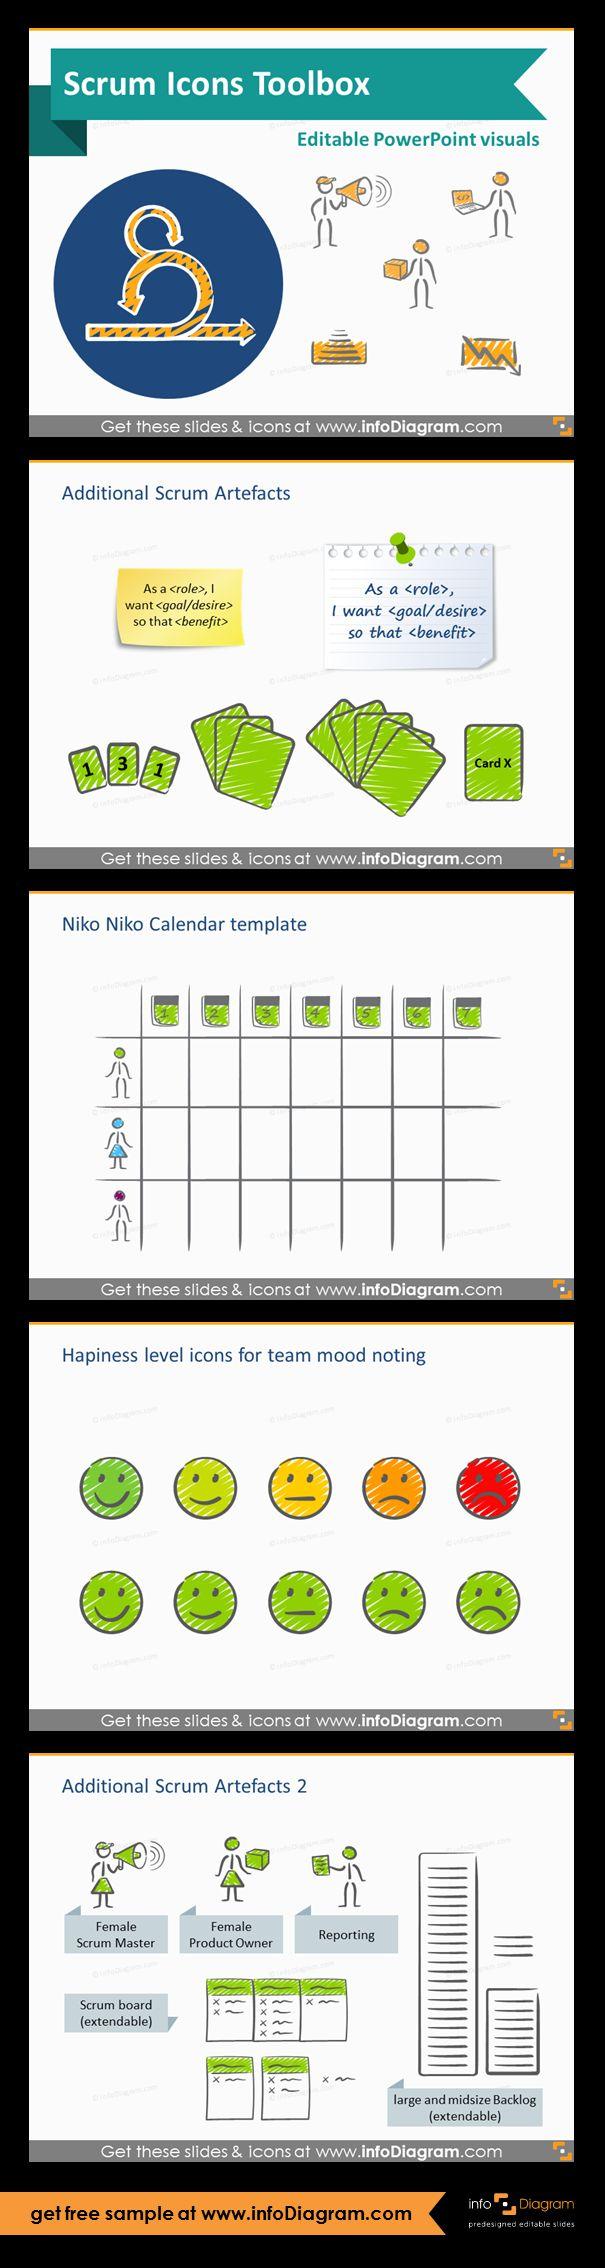 Scrum (software development agile methodology) visuals